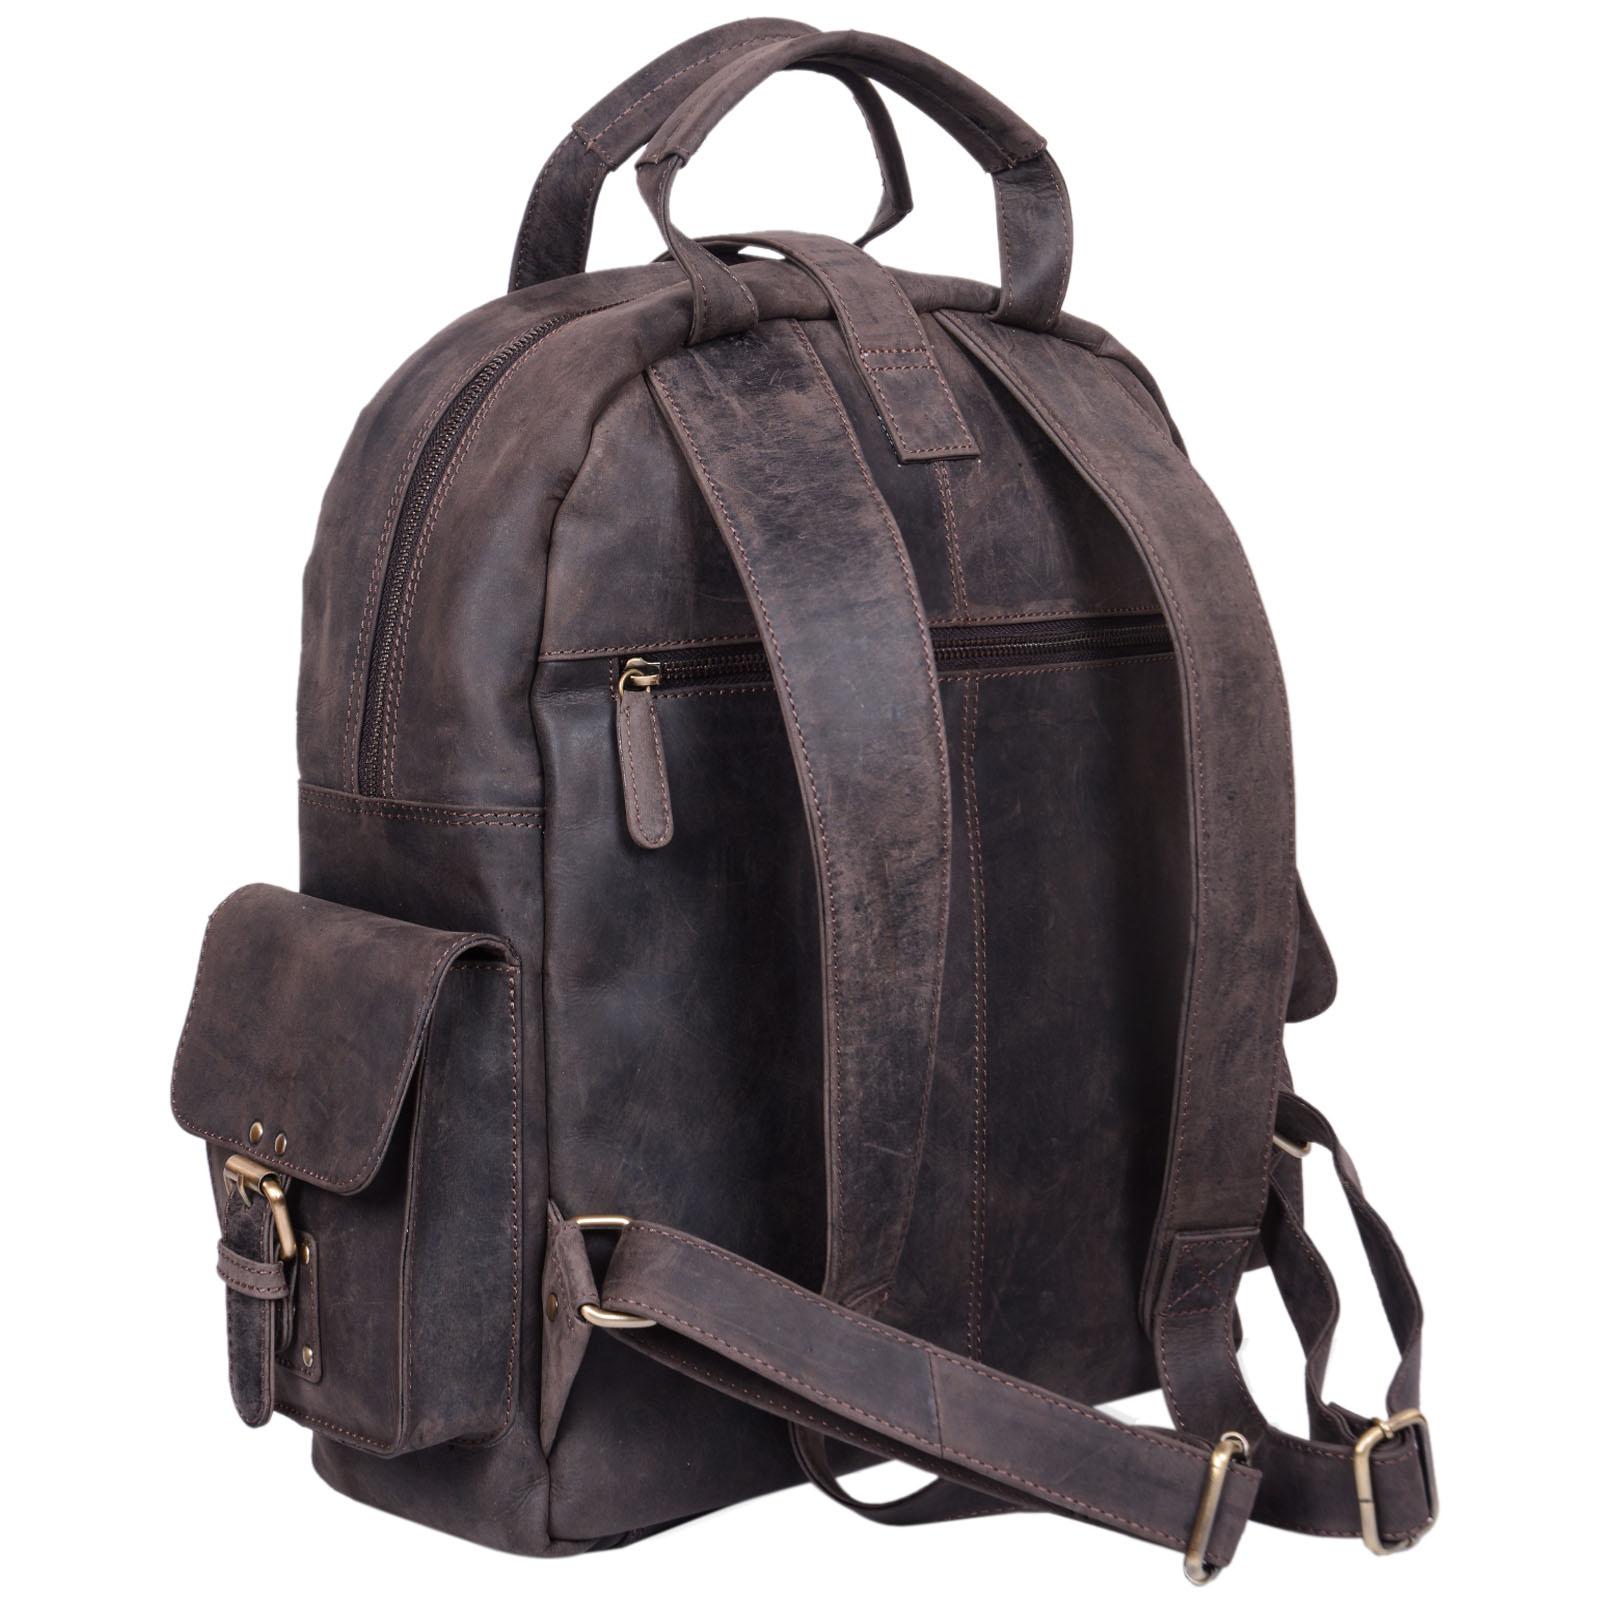 "STILORD ""Nevada"" Rucksack Leder groß im Vintage Design mit 13,3 Zoll Laptopfach Unisex Lederrucksack Uni Schule Lehrer Echtleder  - Bild 14"